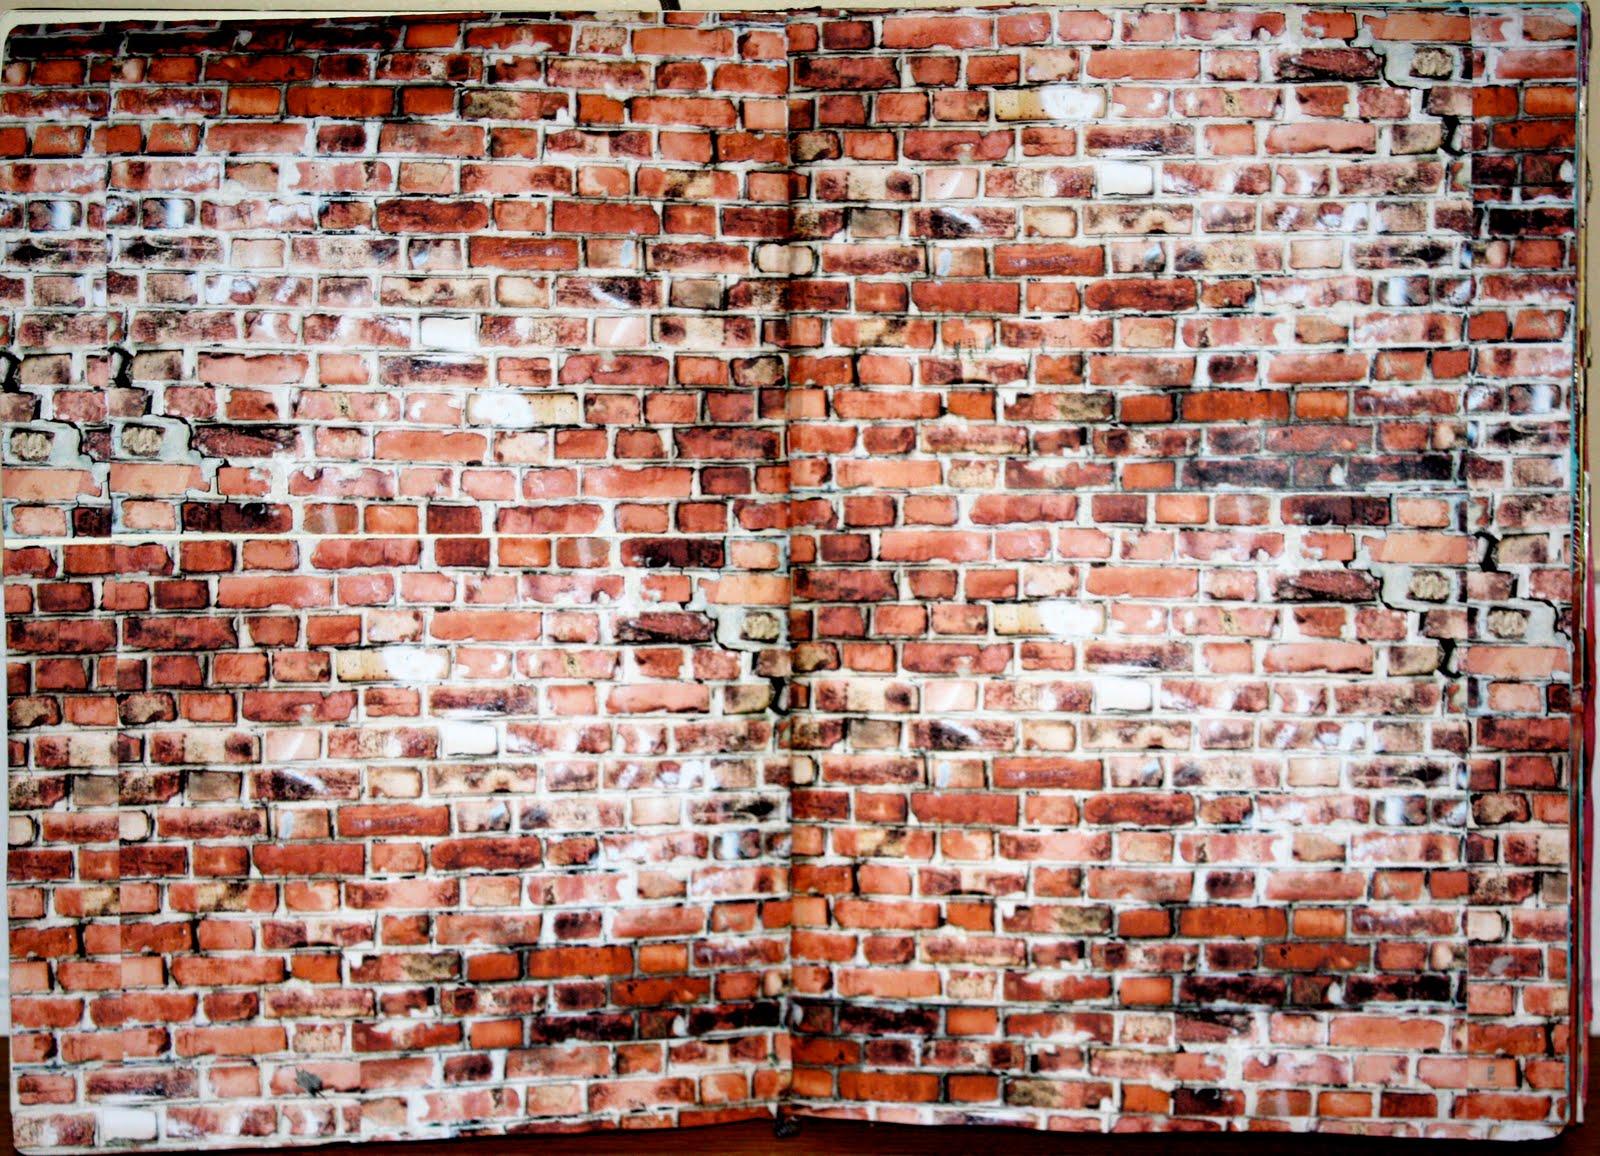 watercolor brick wall at getdrawings com free for personal use